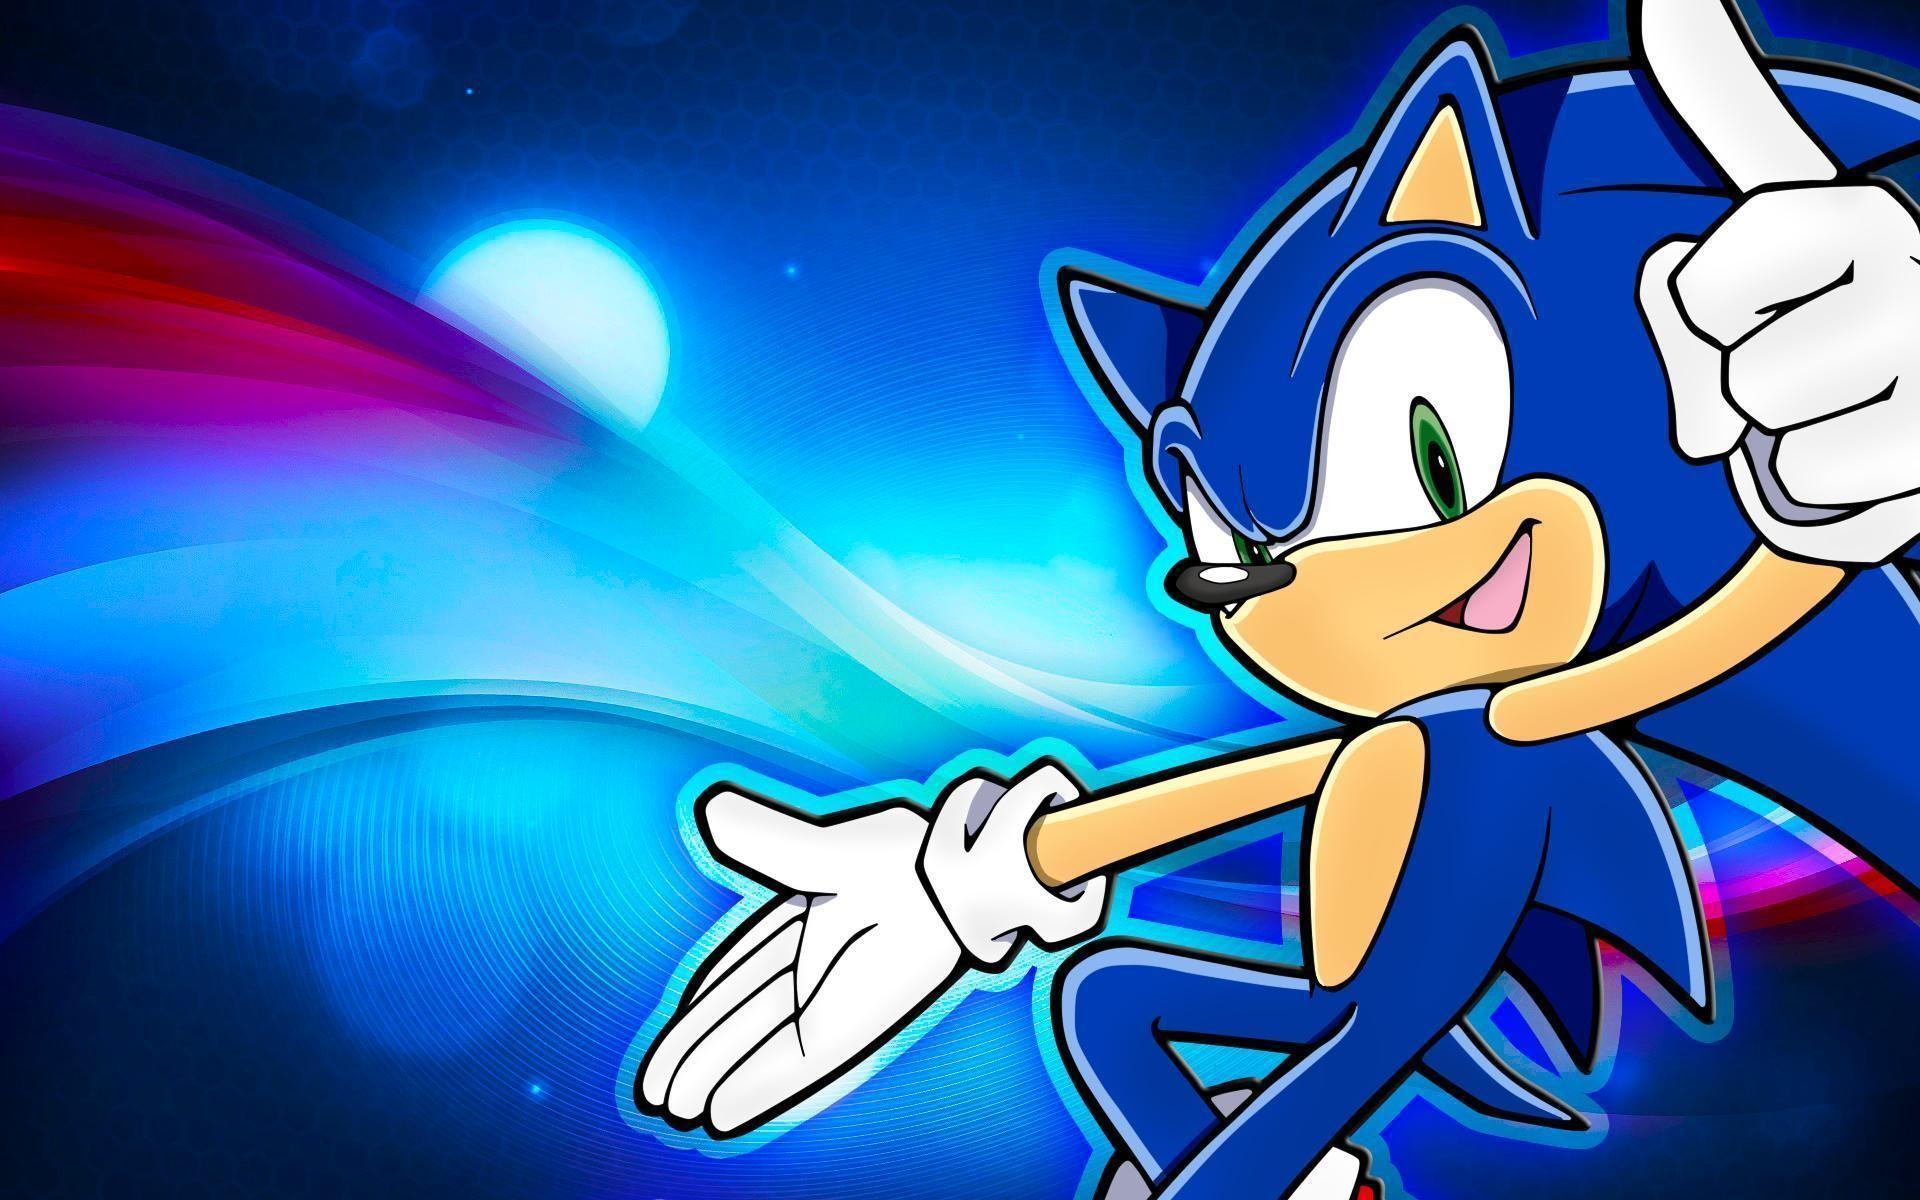 AVW-29: HD <b>Sonic Wallpaper</b> 1080p,